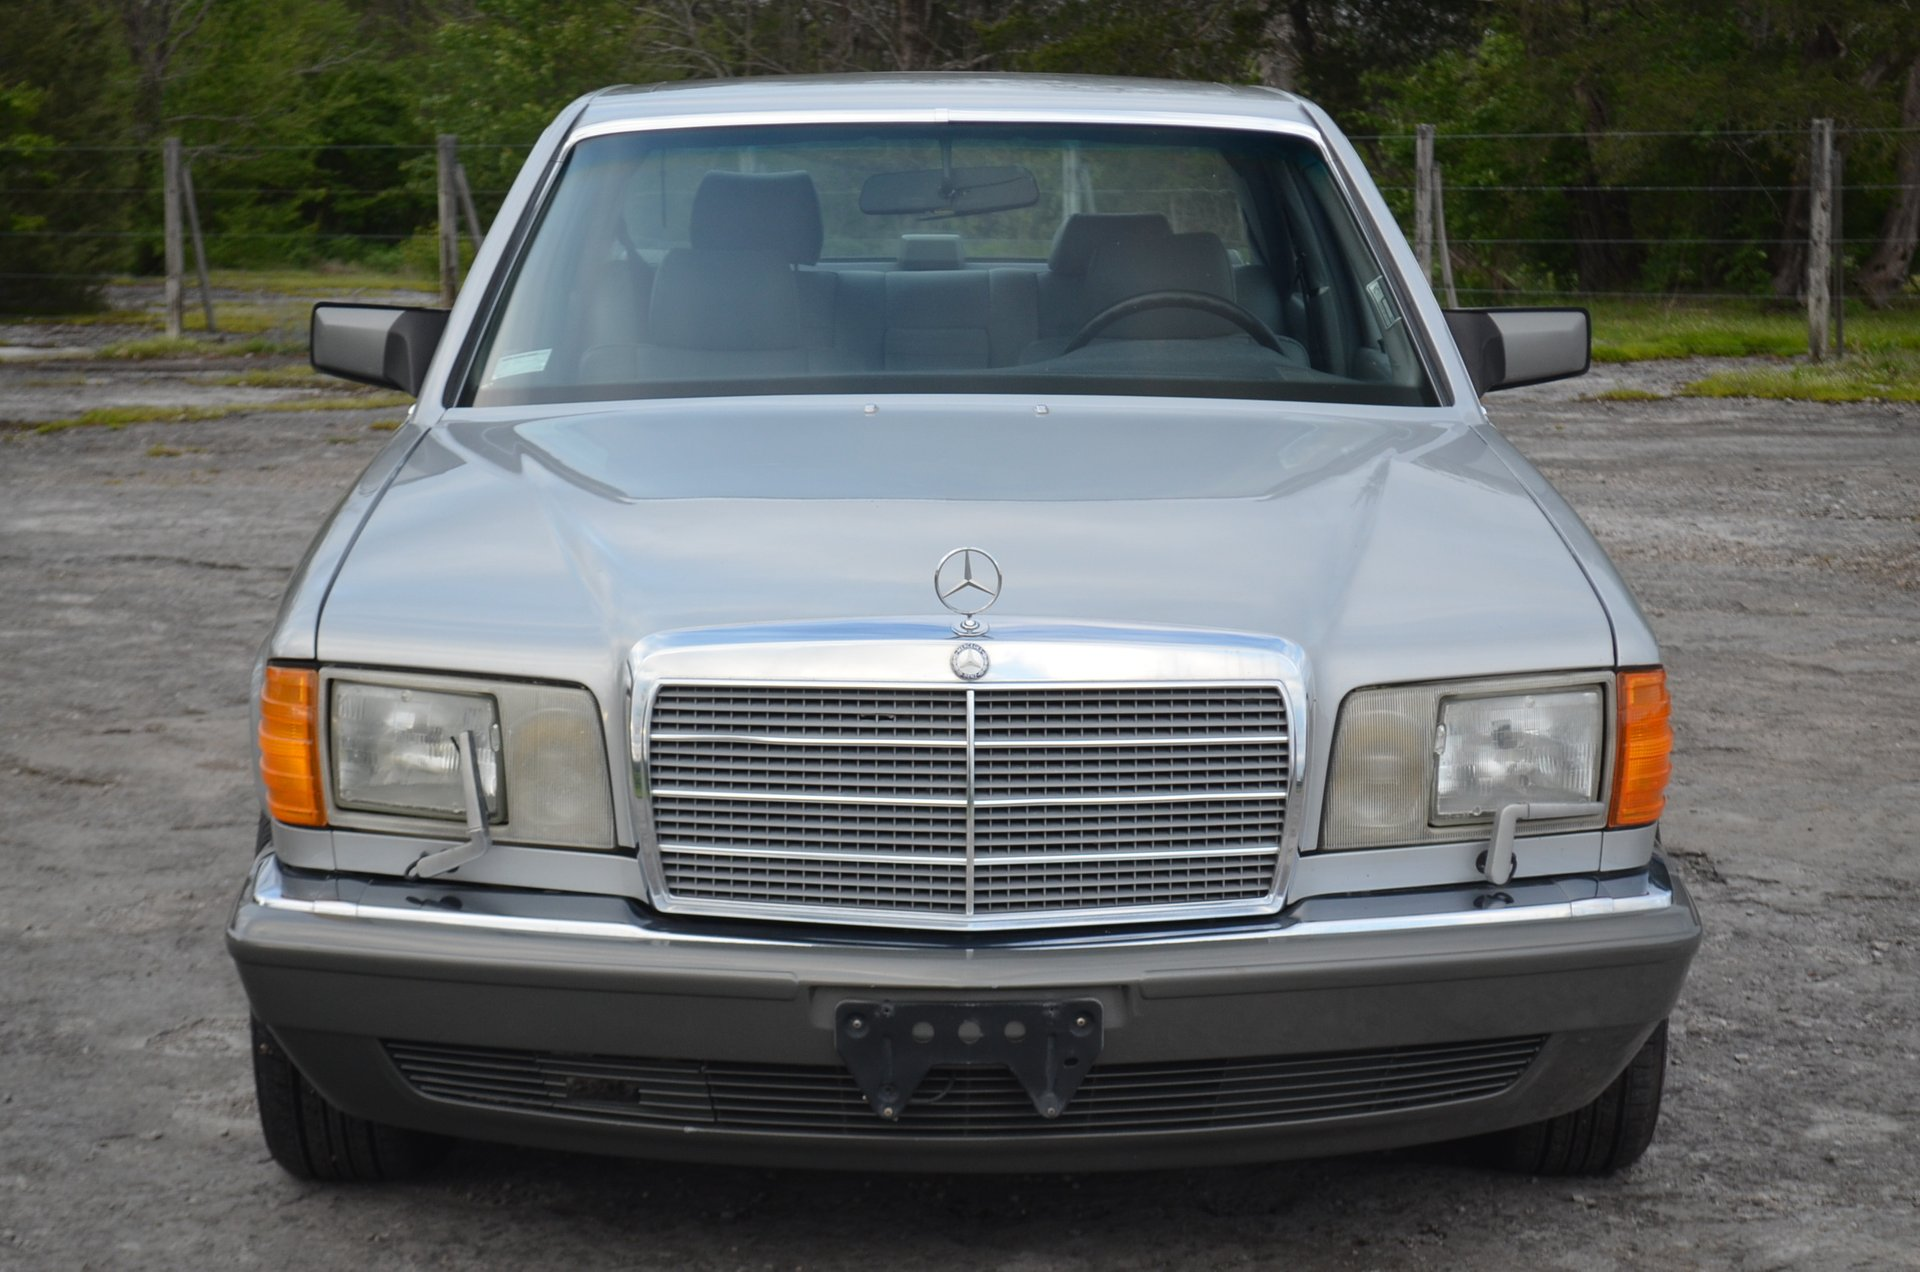 1991 Mercedes-Benz 560 SEL for sale #90156 | MCG